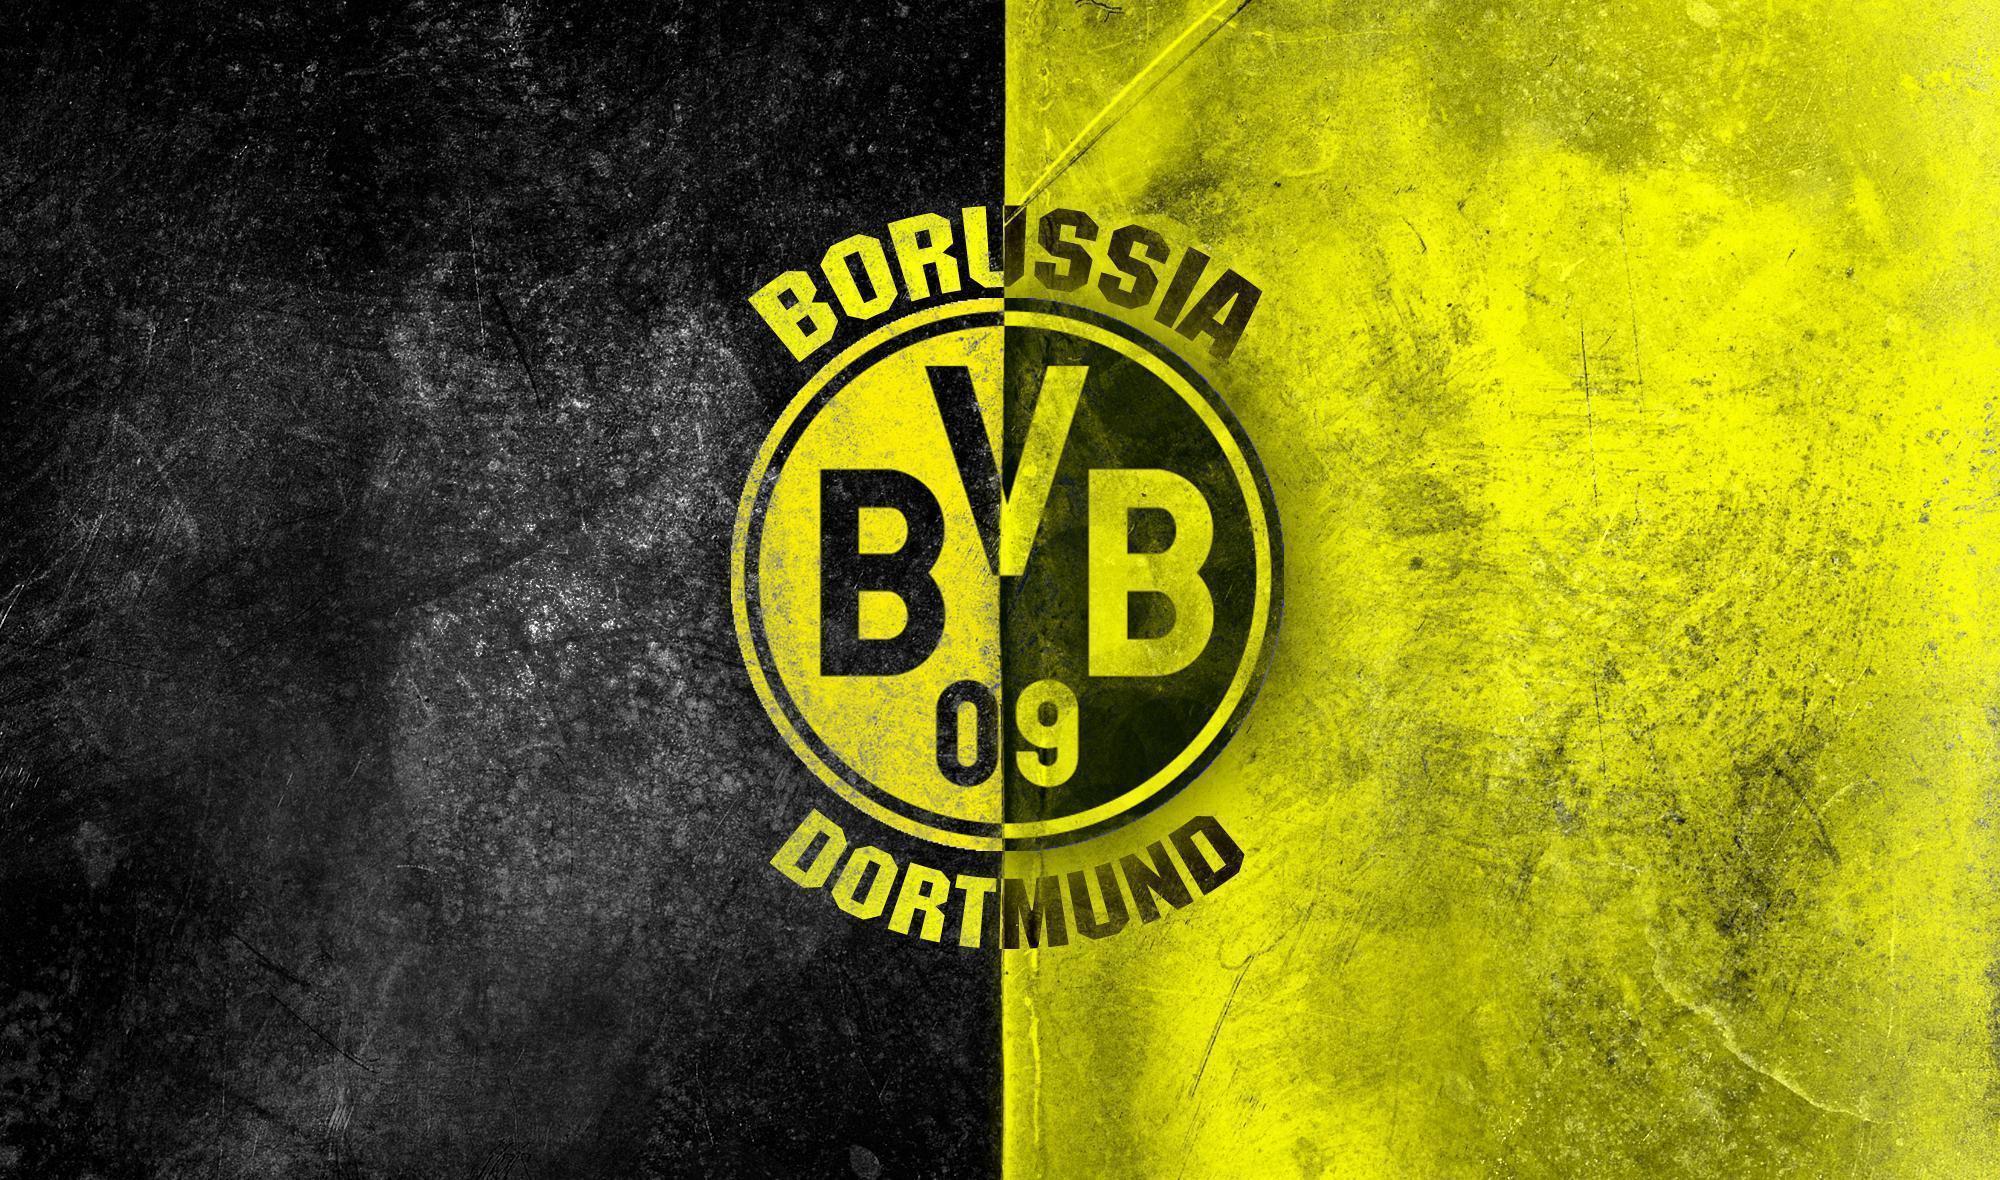 2000x1180 Borussia Dortmund Wallpapers